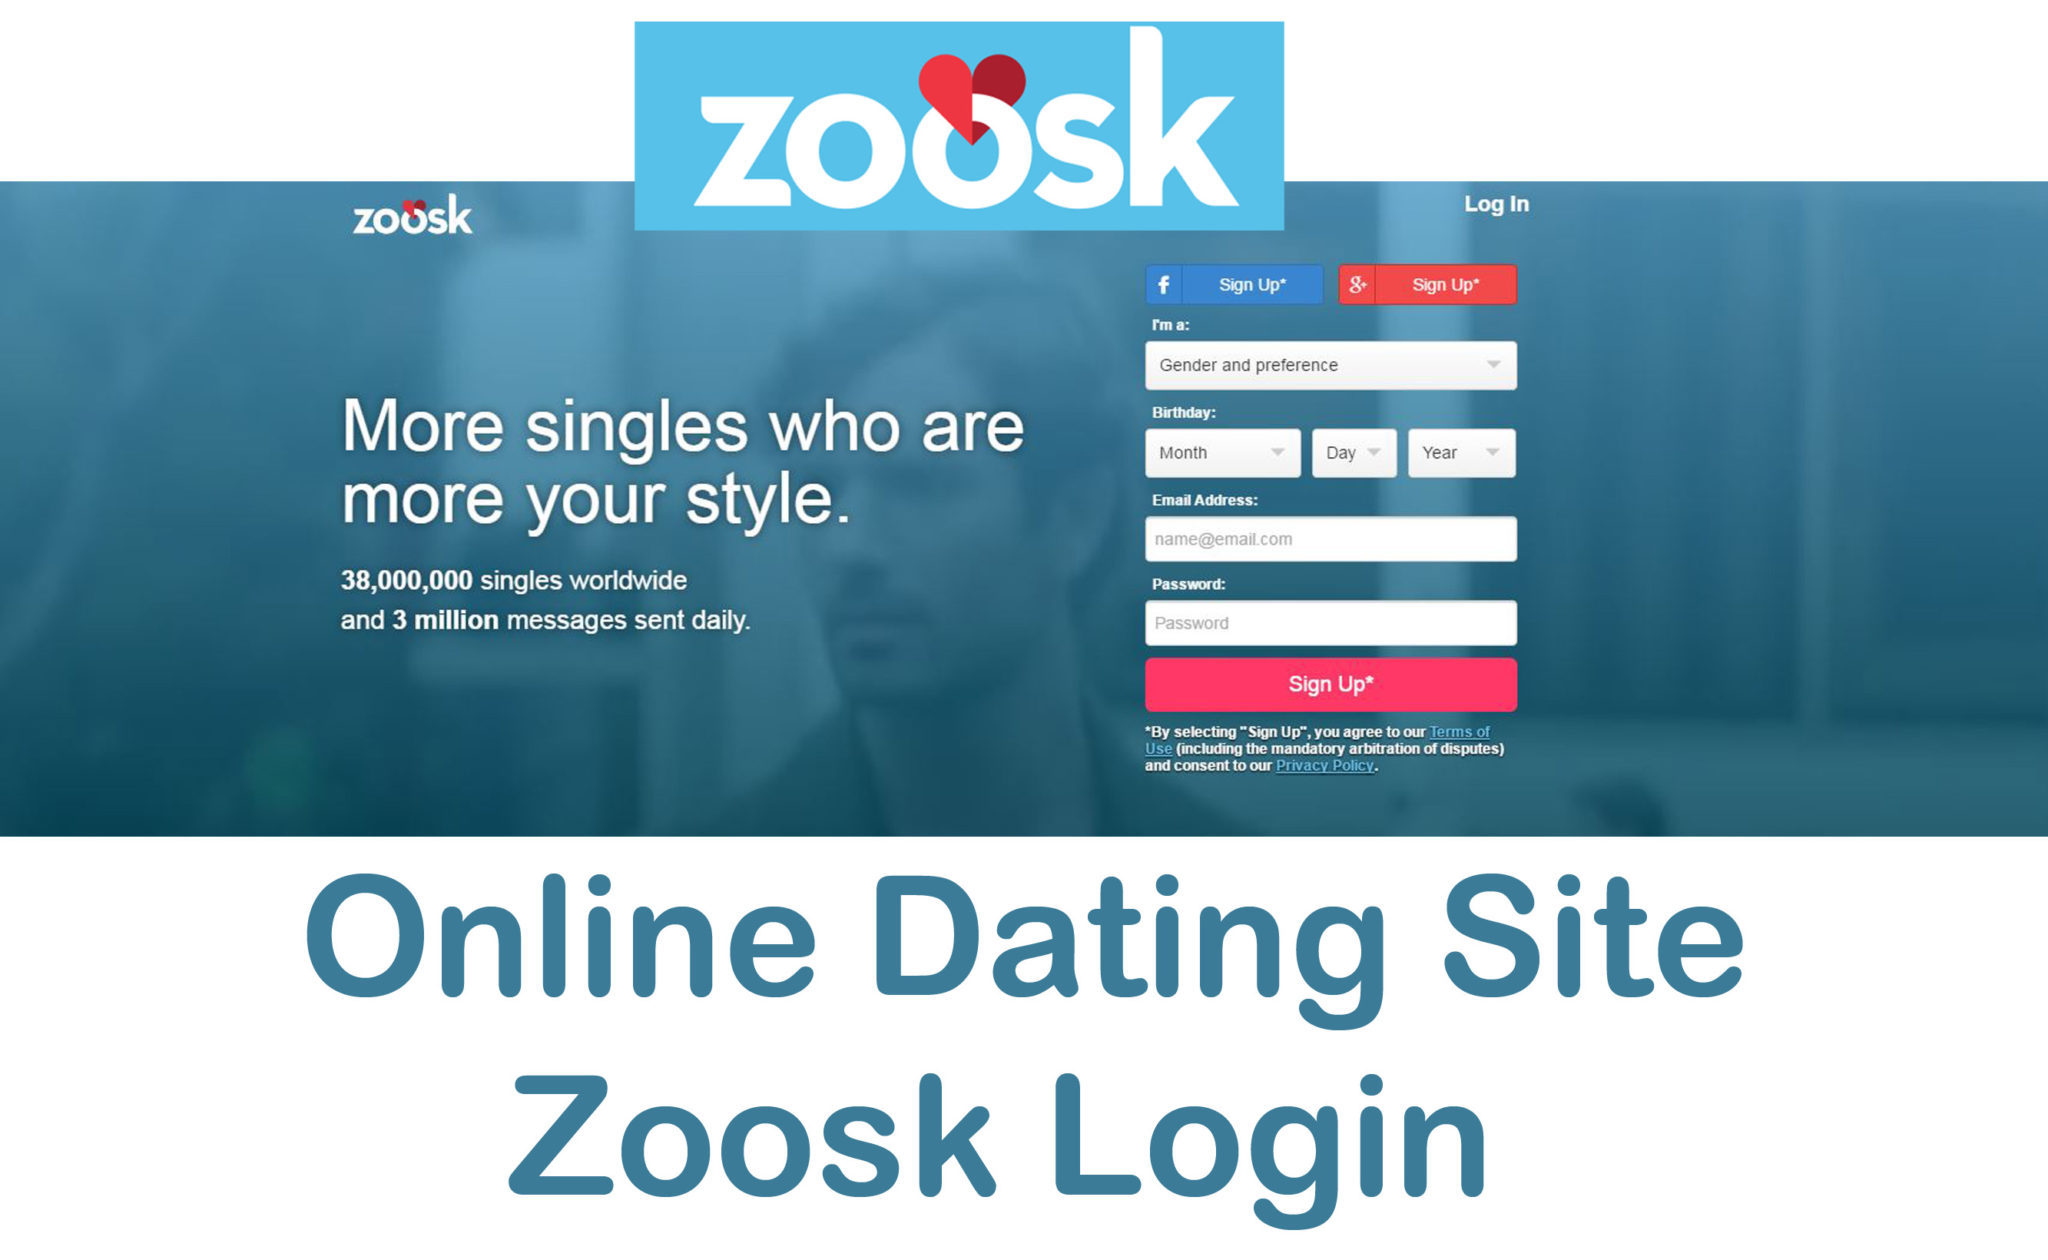 Zoosk - Online Dating Site | Zoosk Login | www.zoosk.com